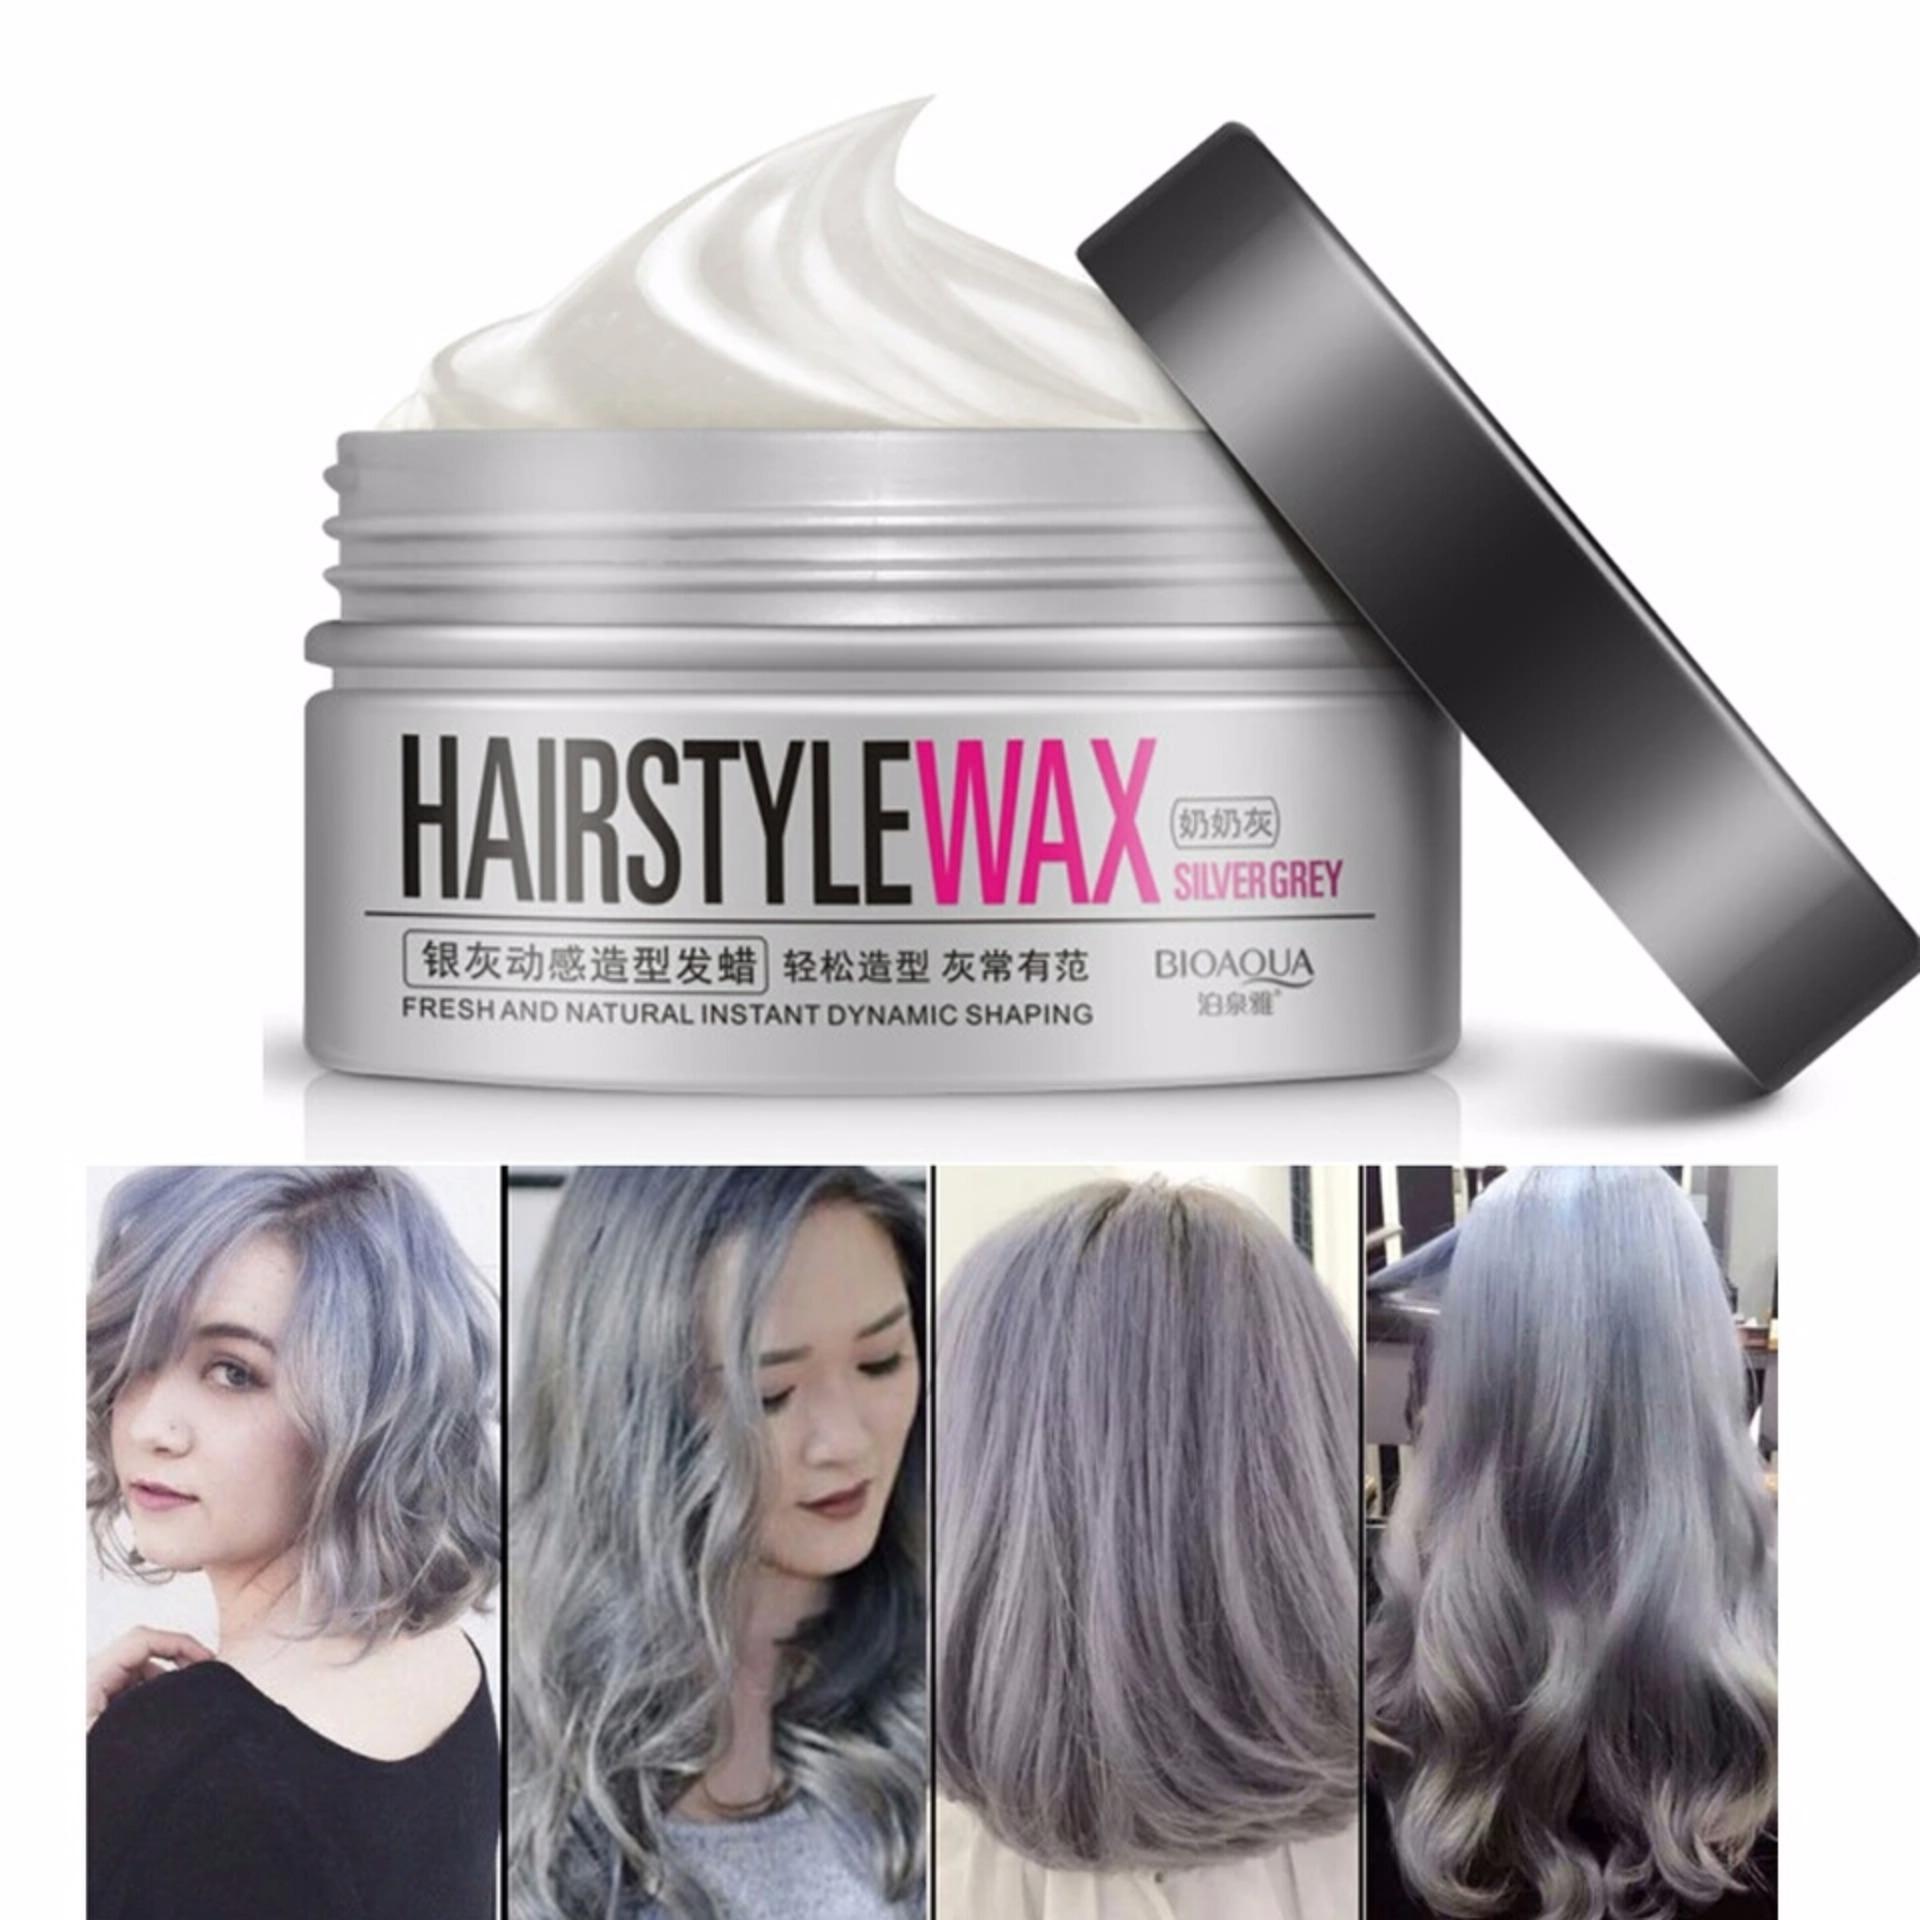 HARGA Original Bioaqua Hairstyle Wax Pewarna Rambut Pria Wanita Pomade 100g – Silver Grey – Paling Laris Terbagus